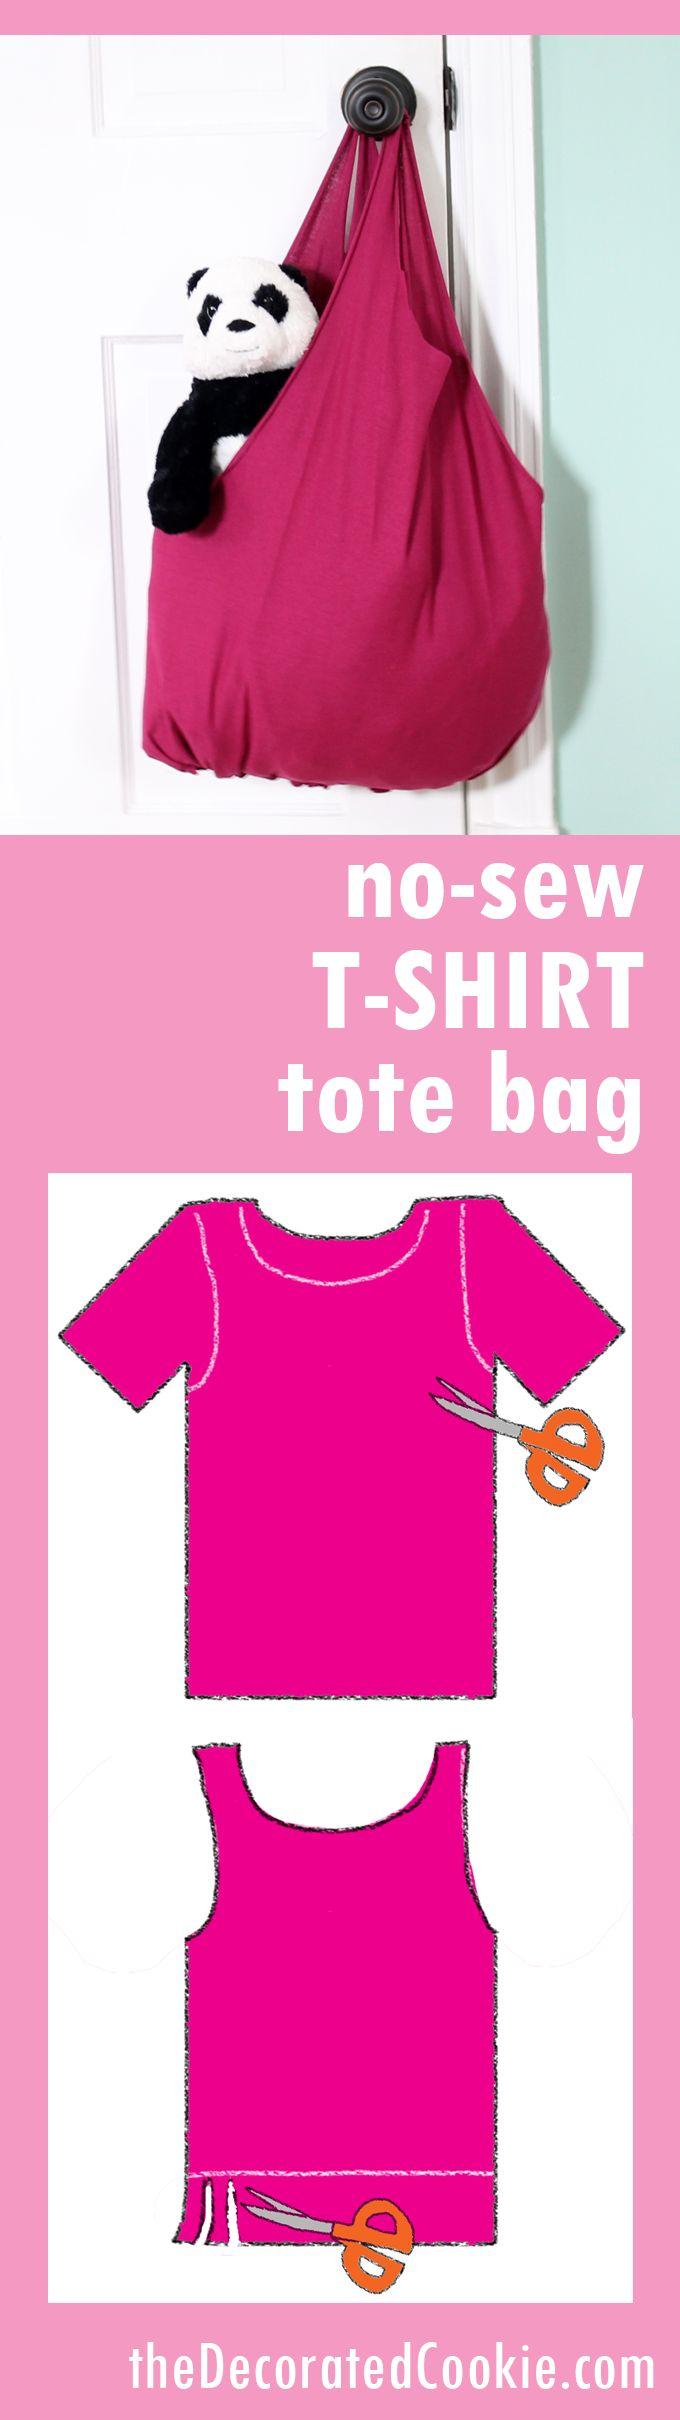 no-sew T-shirt tote bag EASY craft